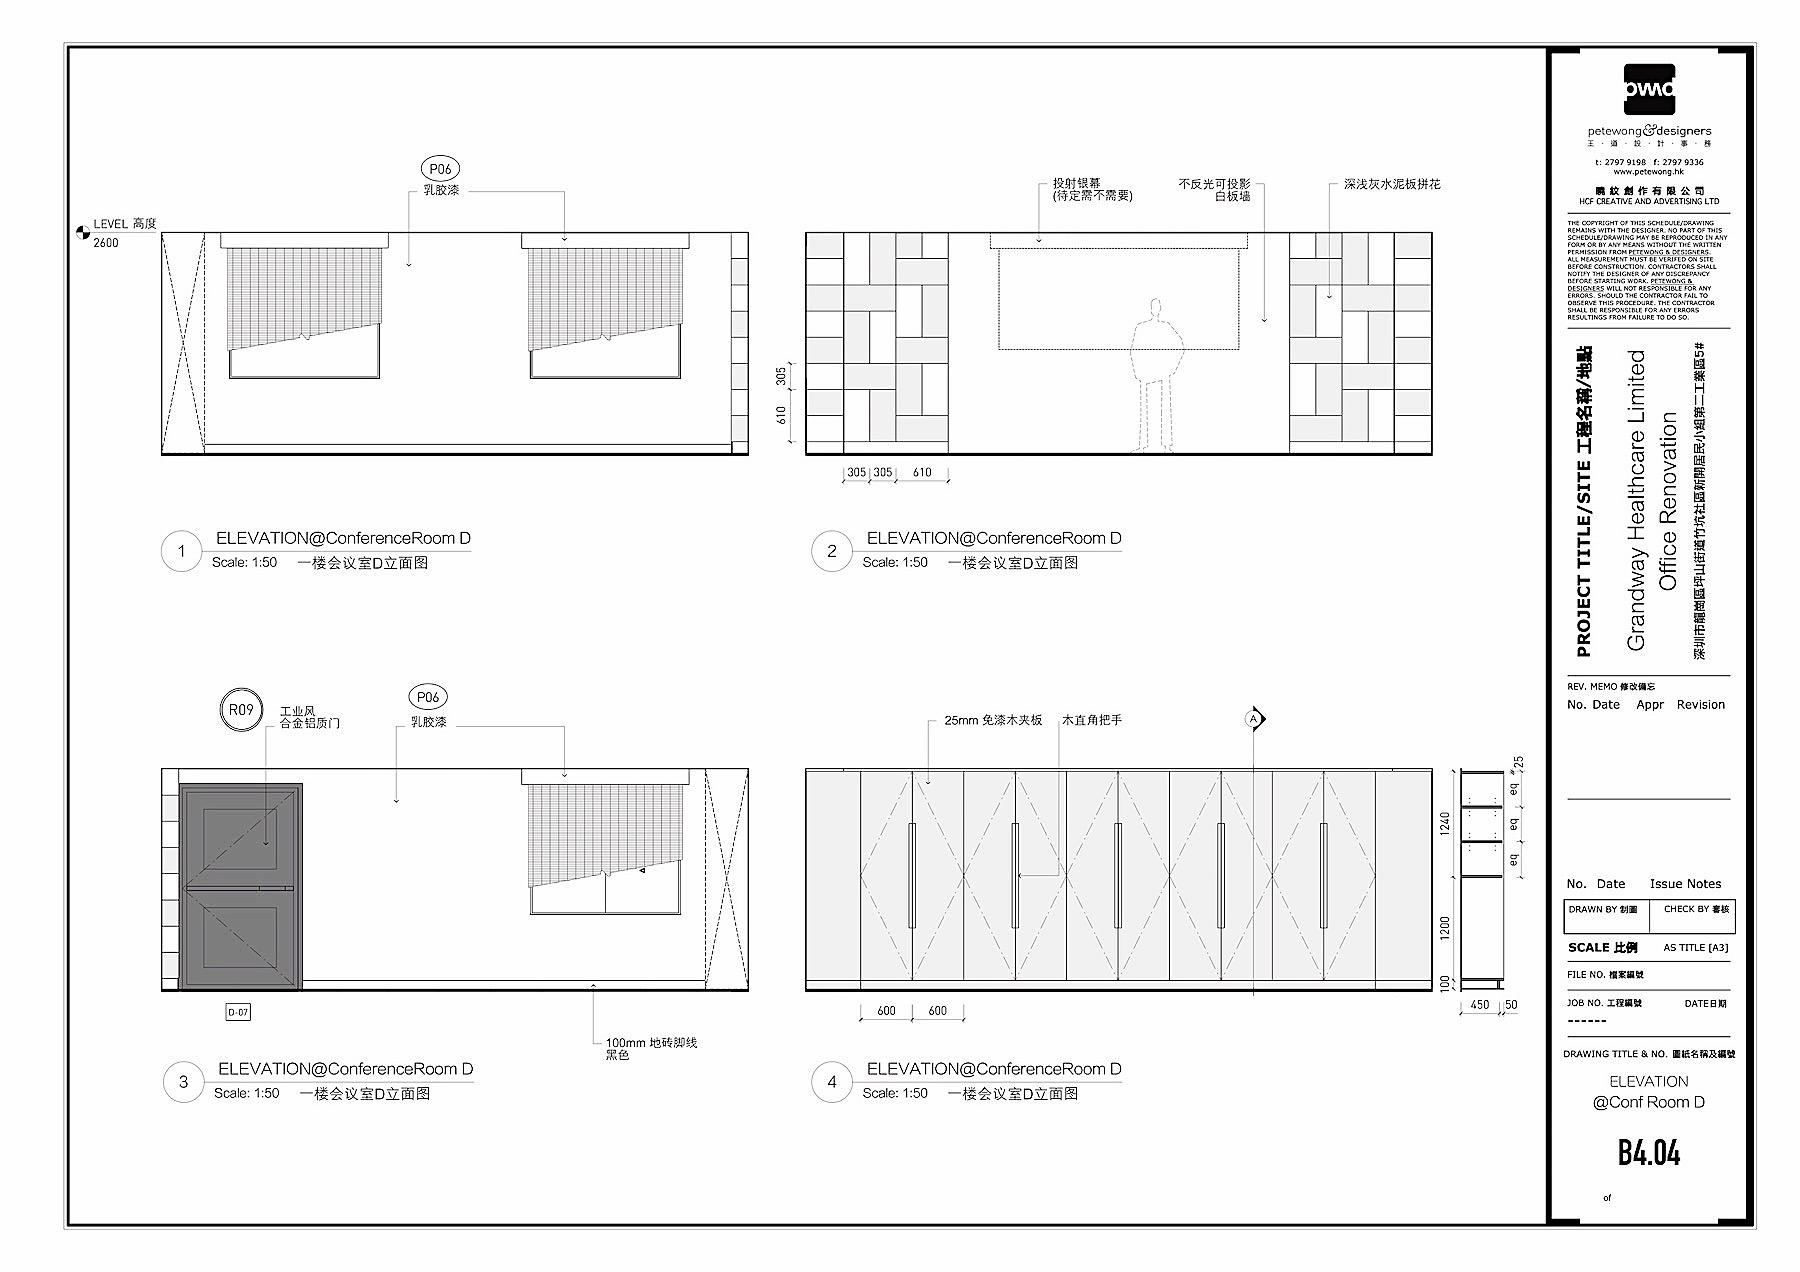 Grandway Office Renovation 2018 Drawing 12